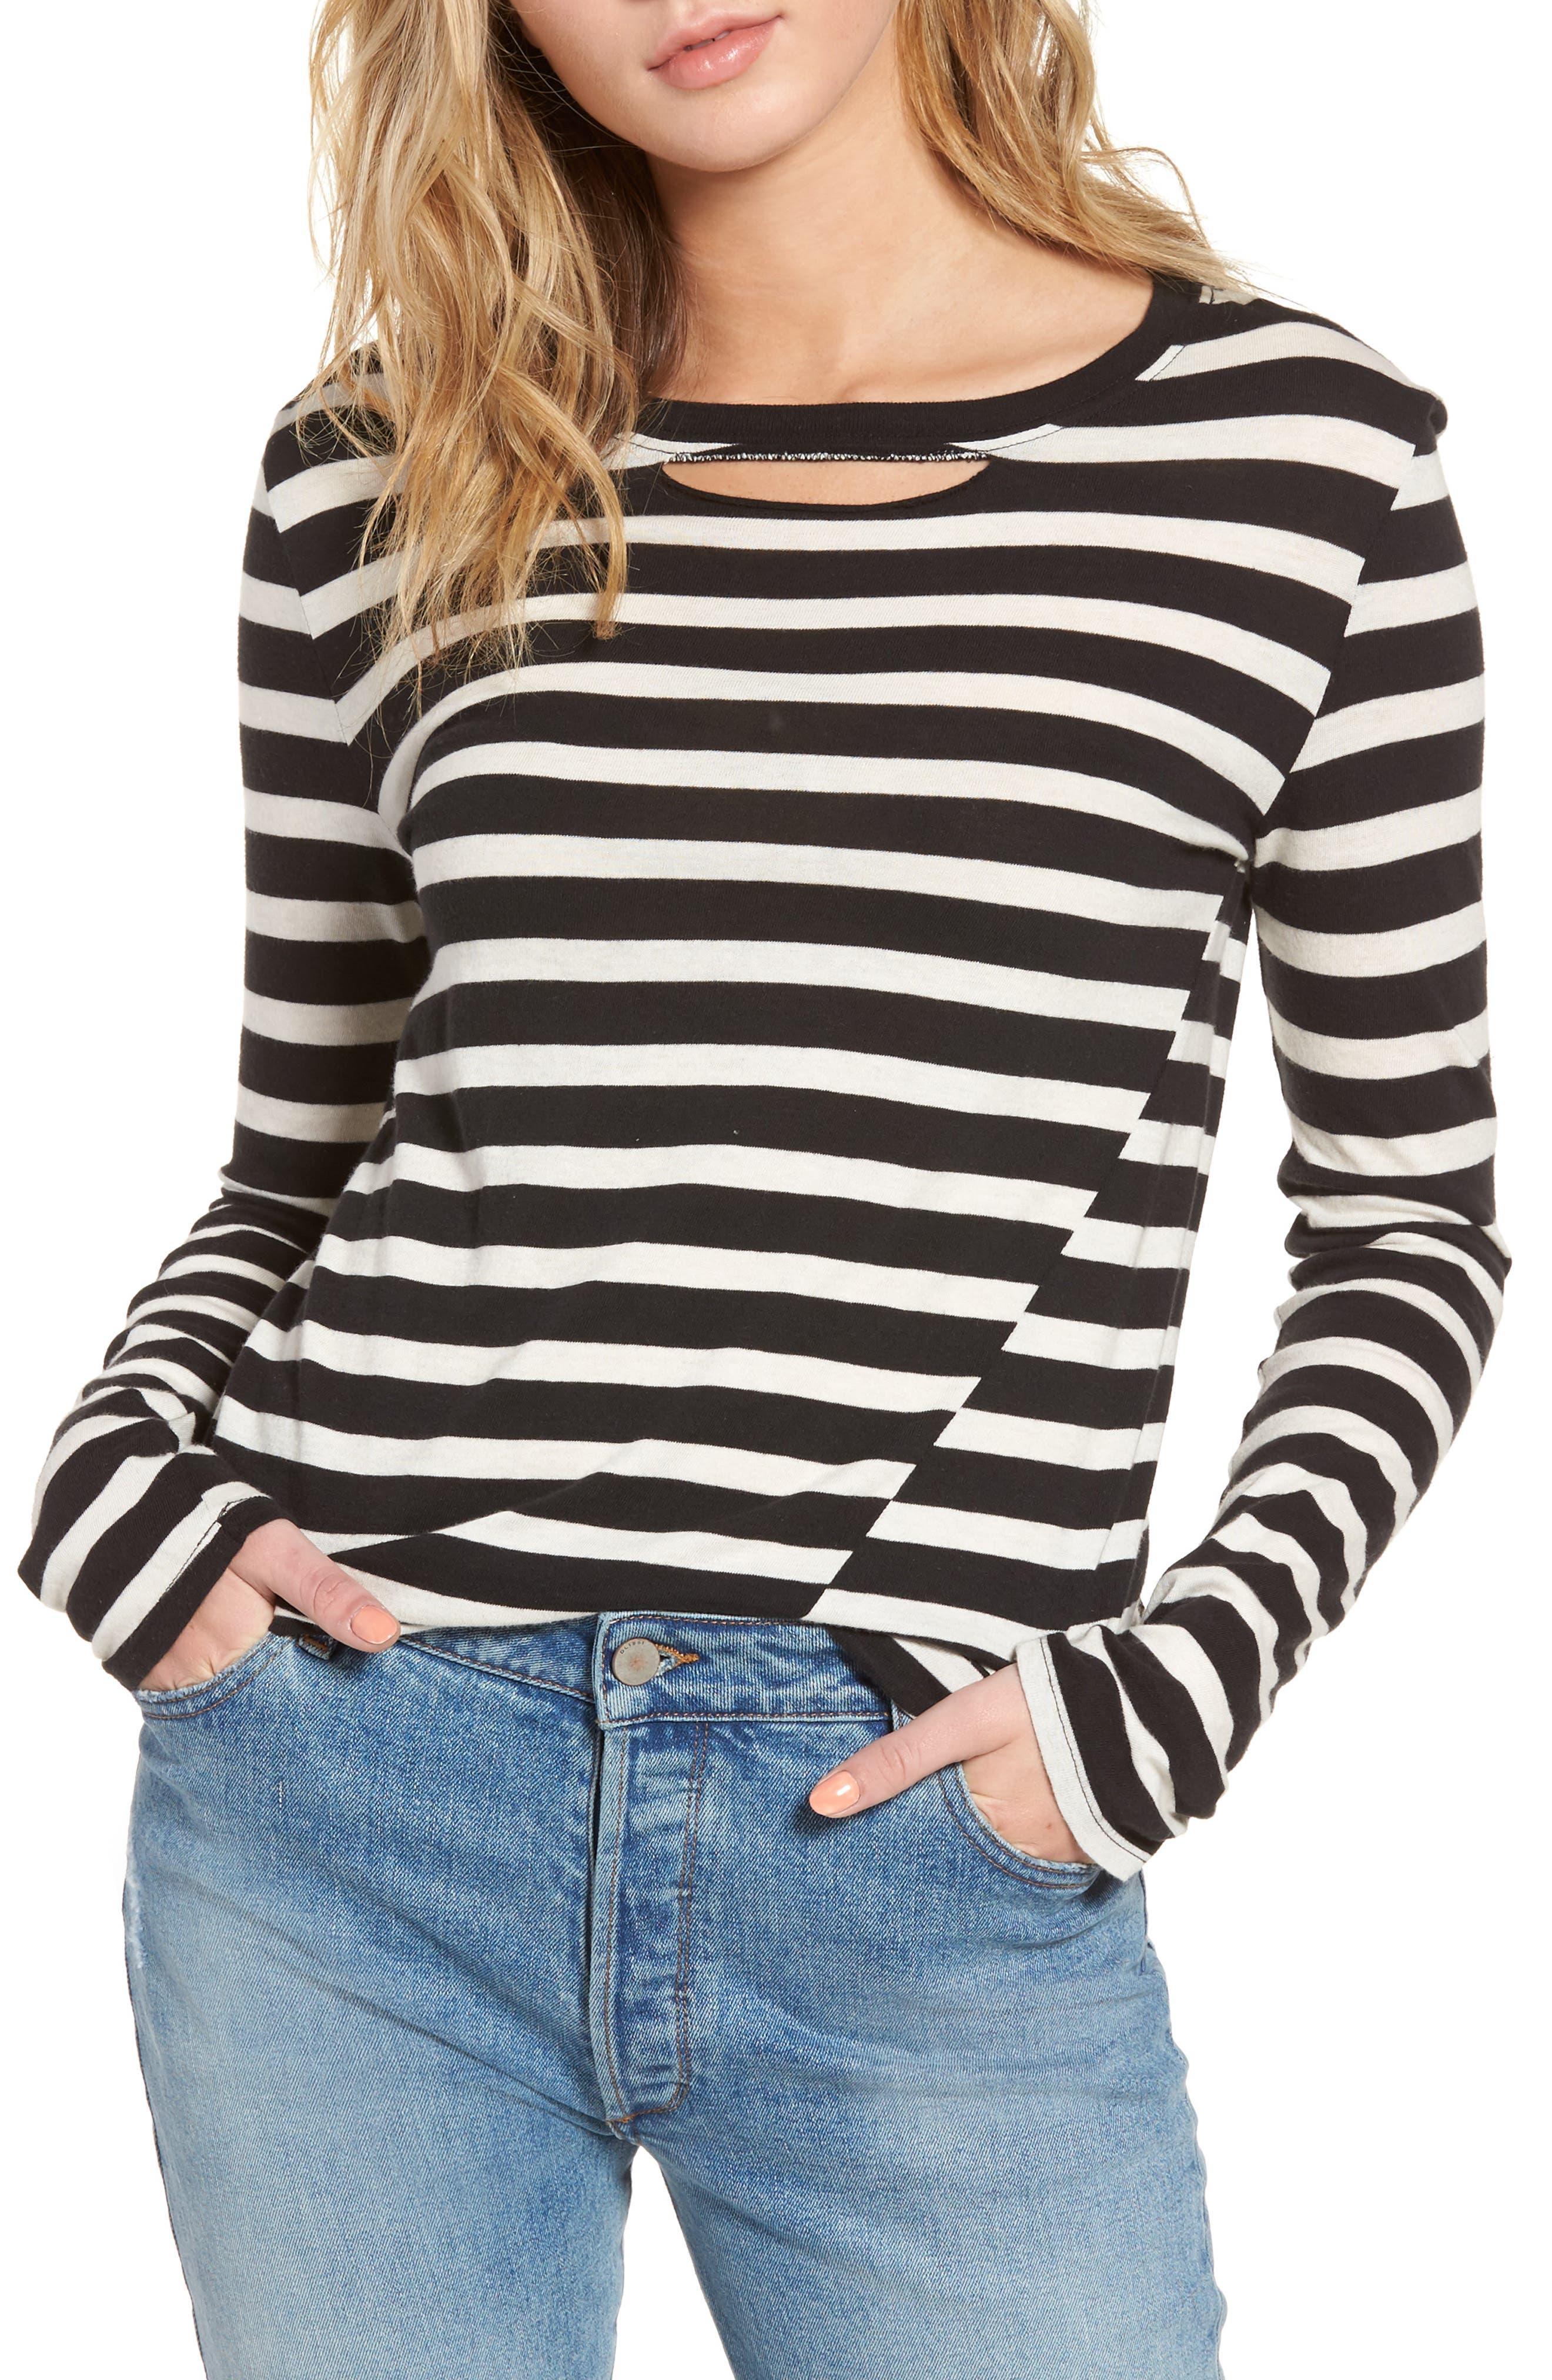 Main Image - Pam & Gela Stripe Long Sleeve Top